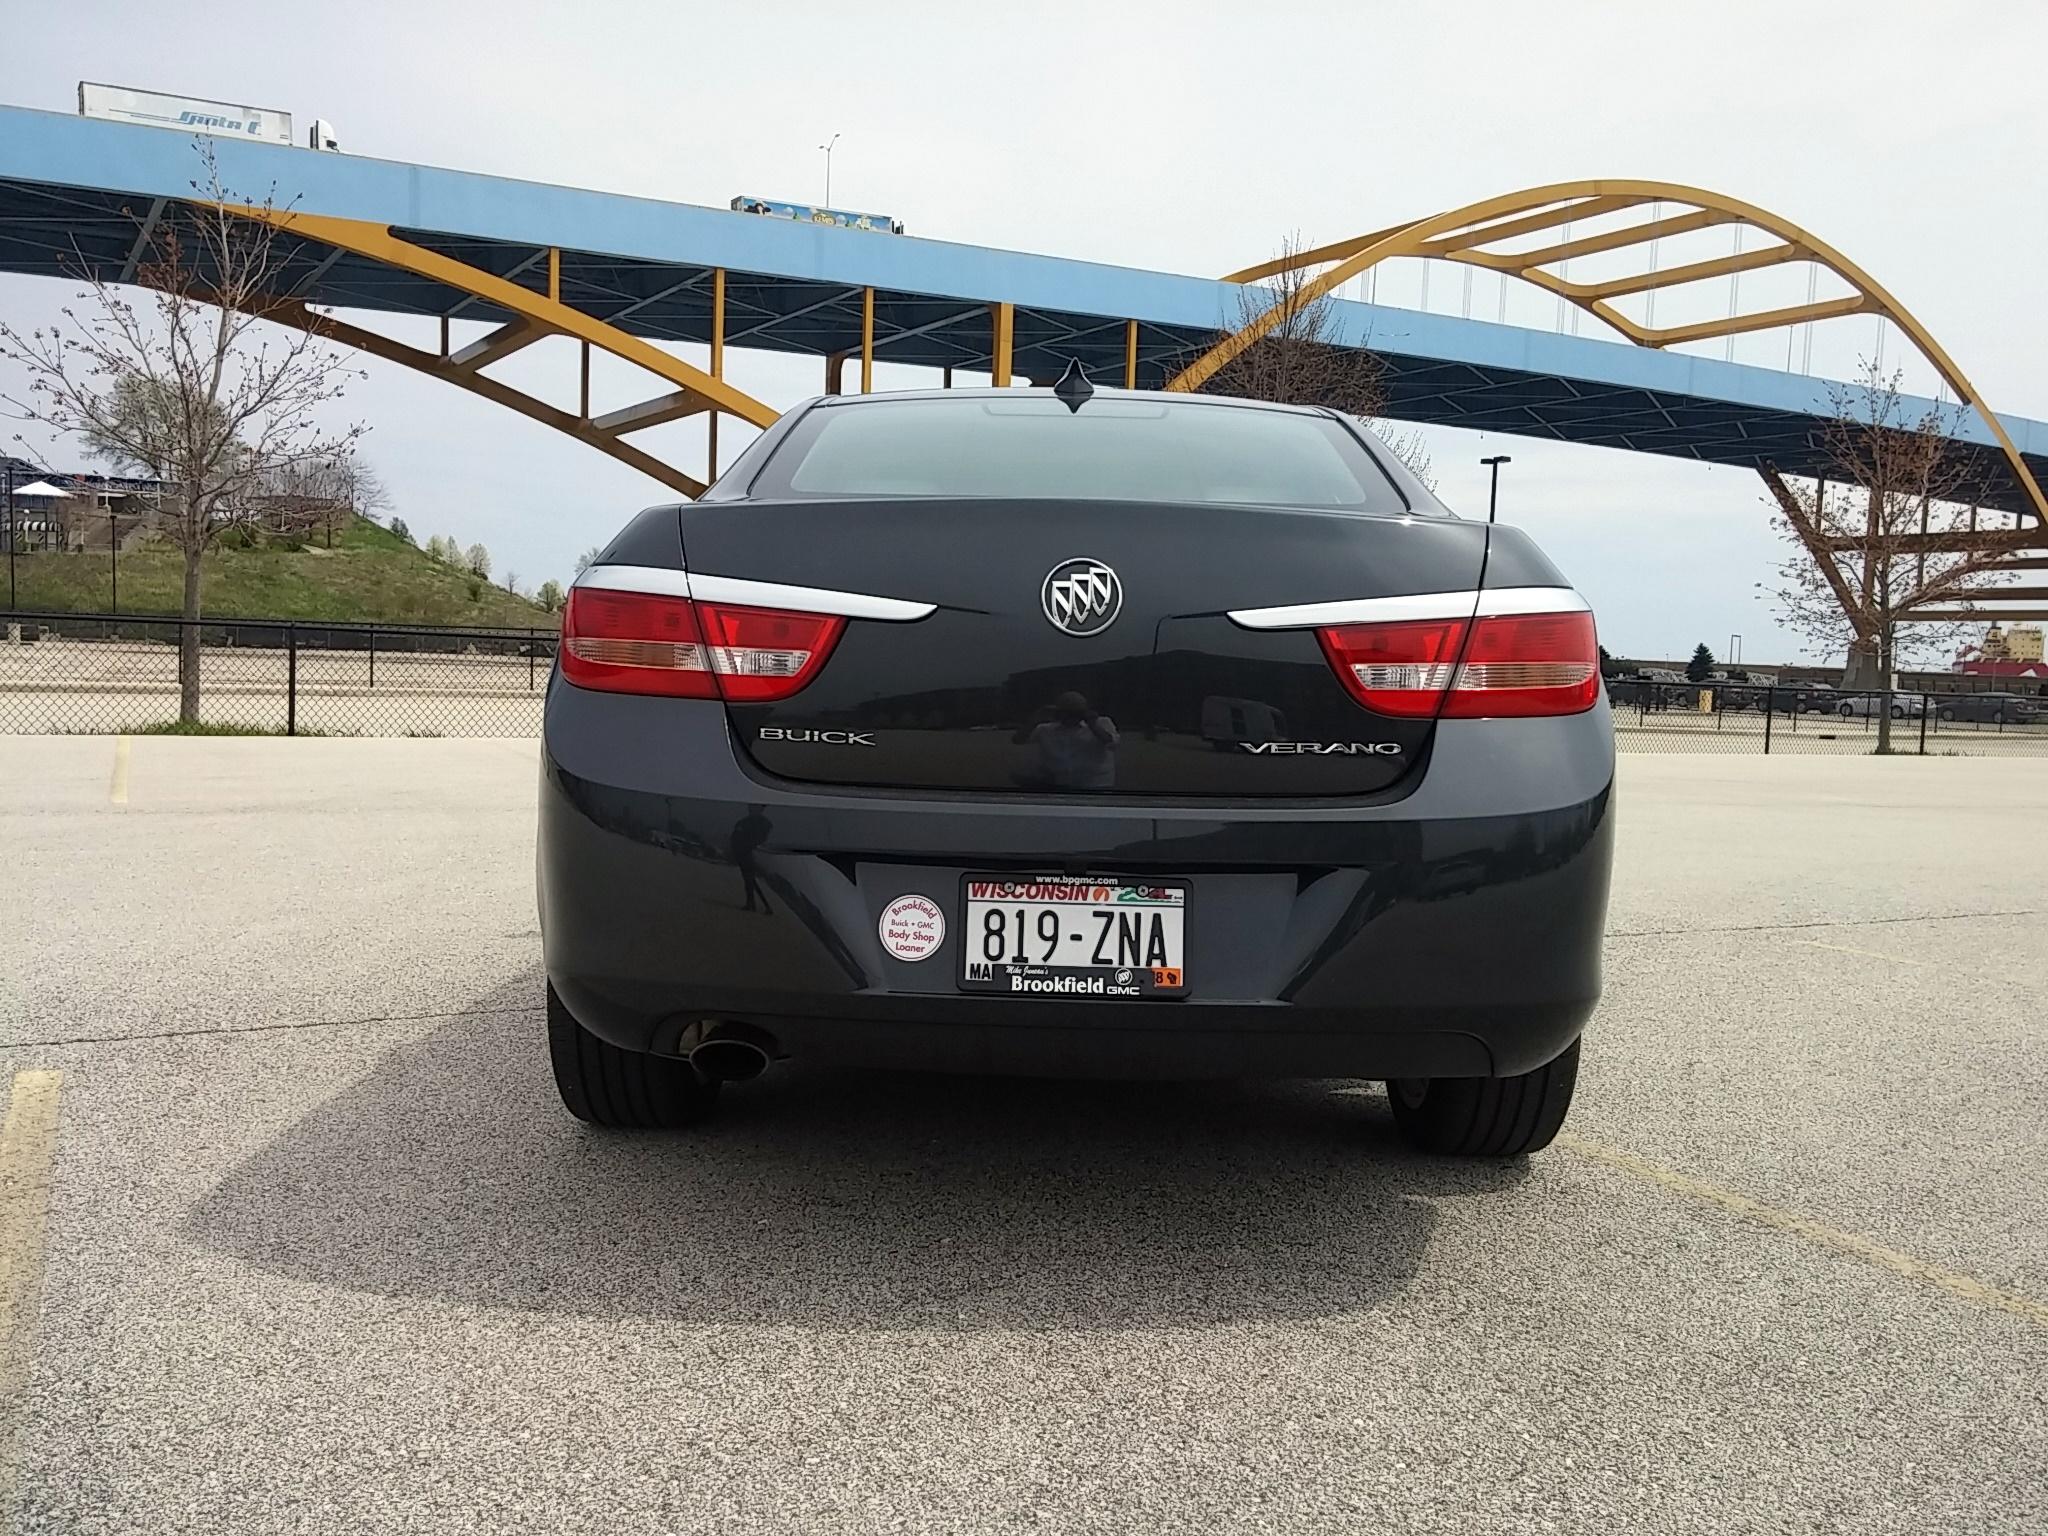 Produžena garancija General Motorsa